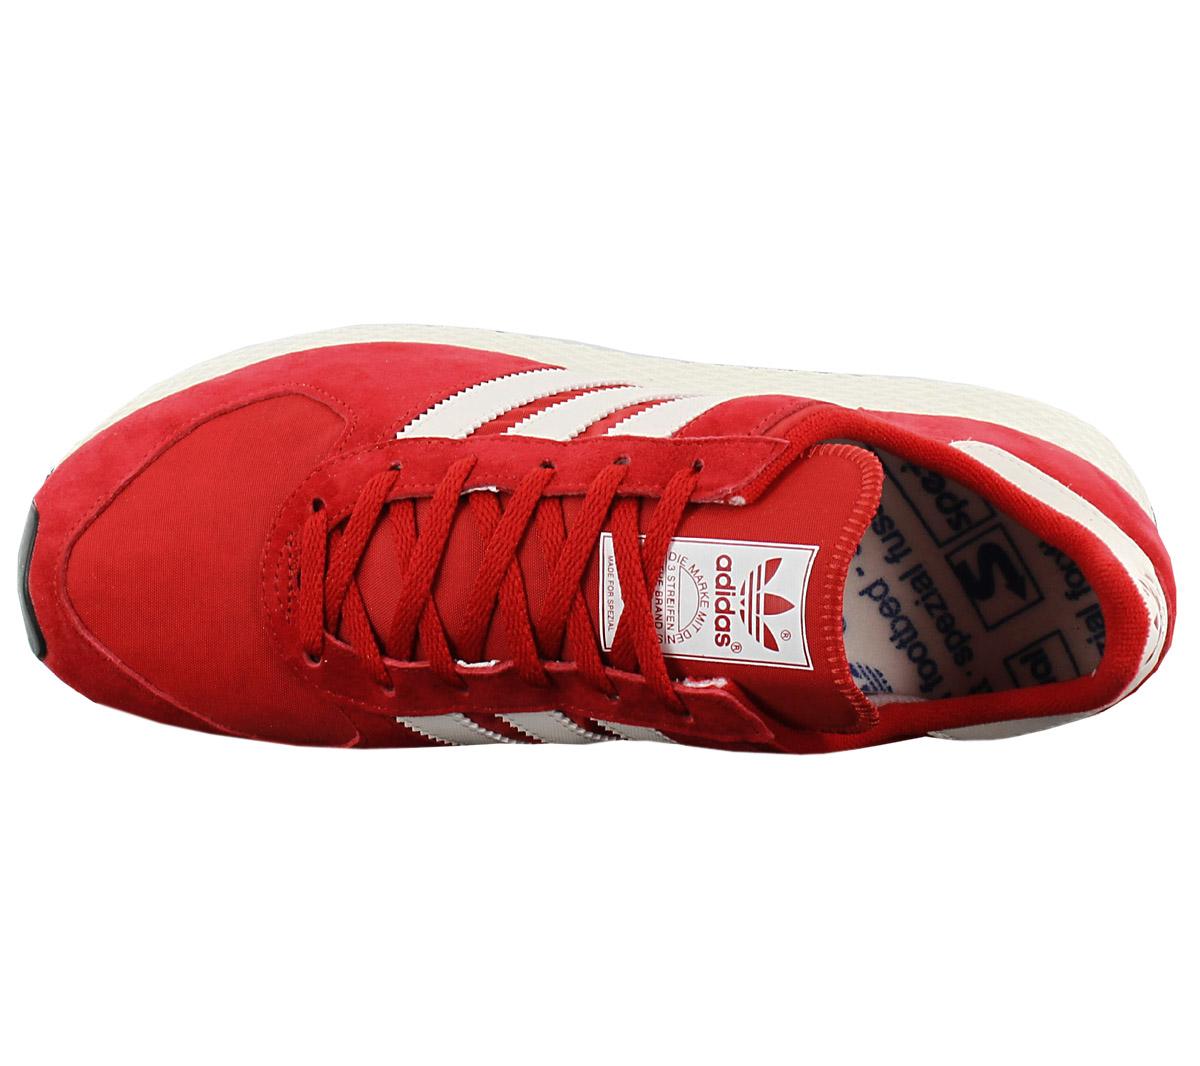 Adidas Originals Atlanta Spezial Herren Turnschuhe Rot Schuh Turnschuh ... Sofortige Lieferung